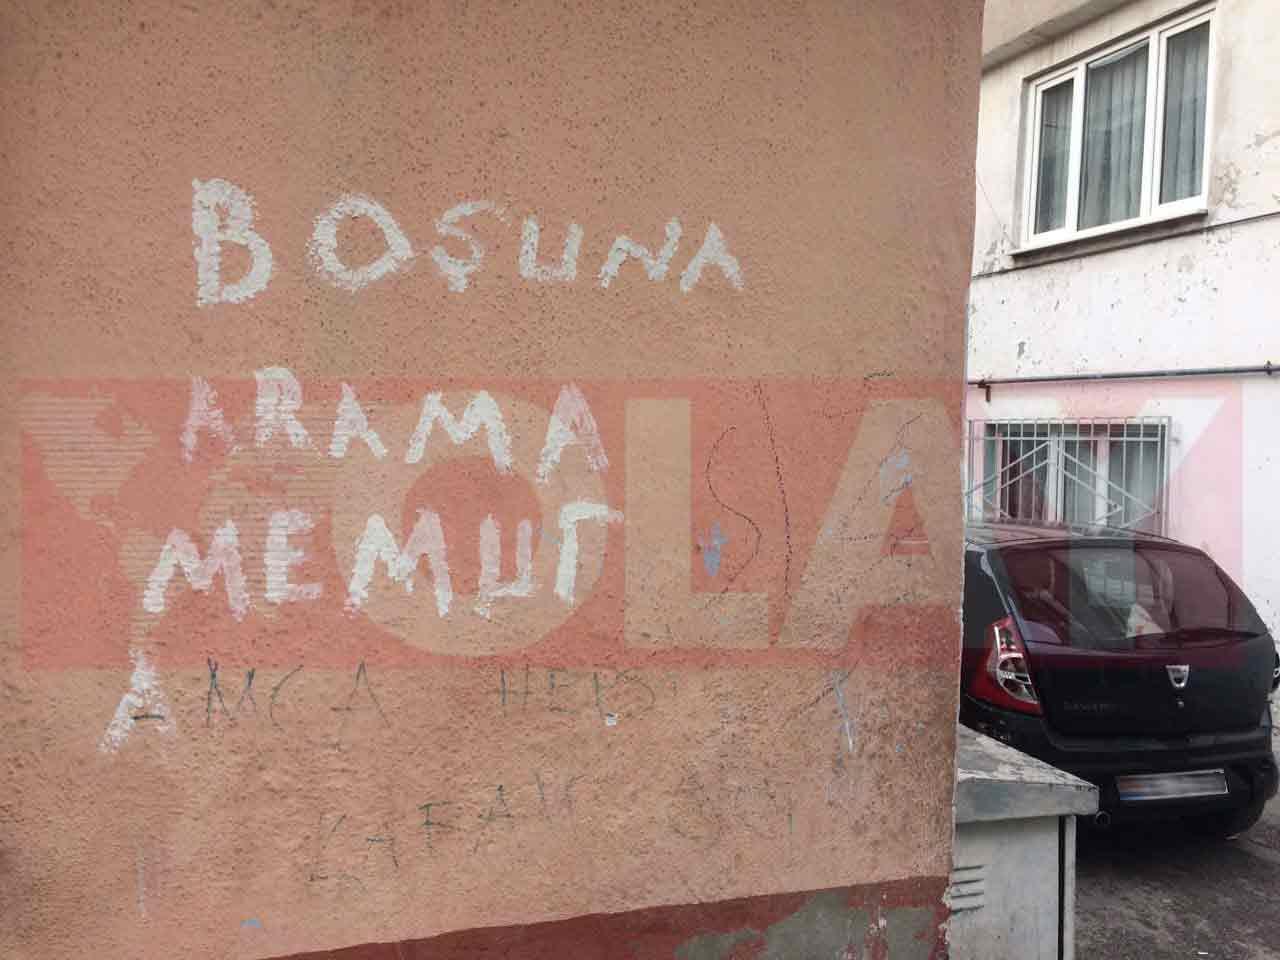 Bursa'da 2 bin polisle uyuşturucu operasyonu! 1